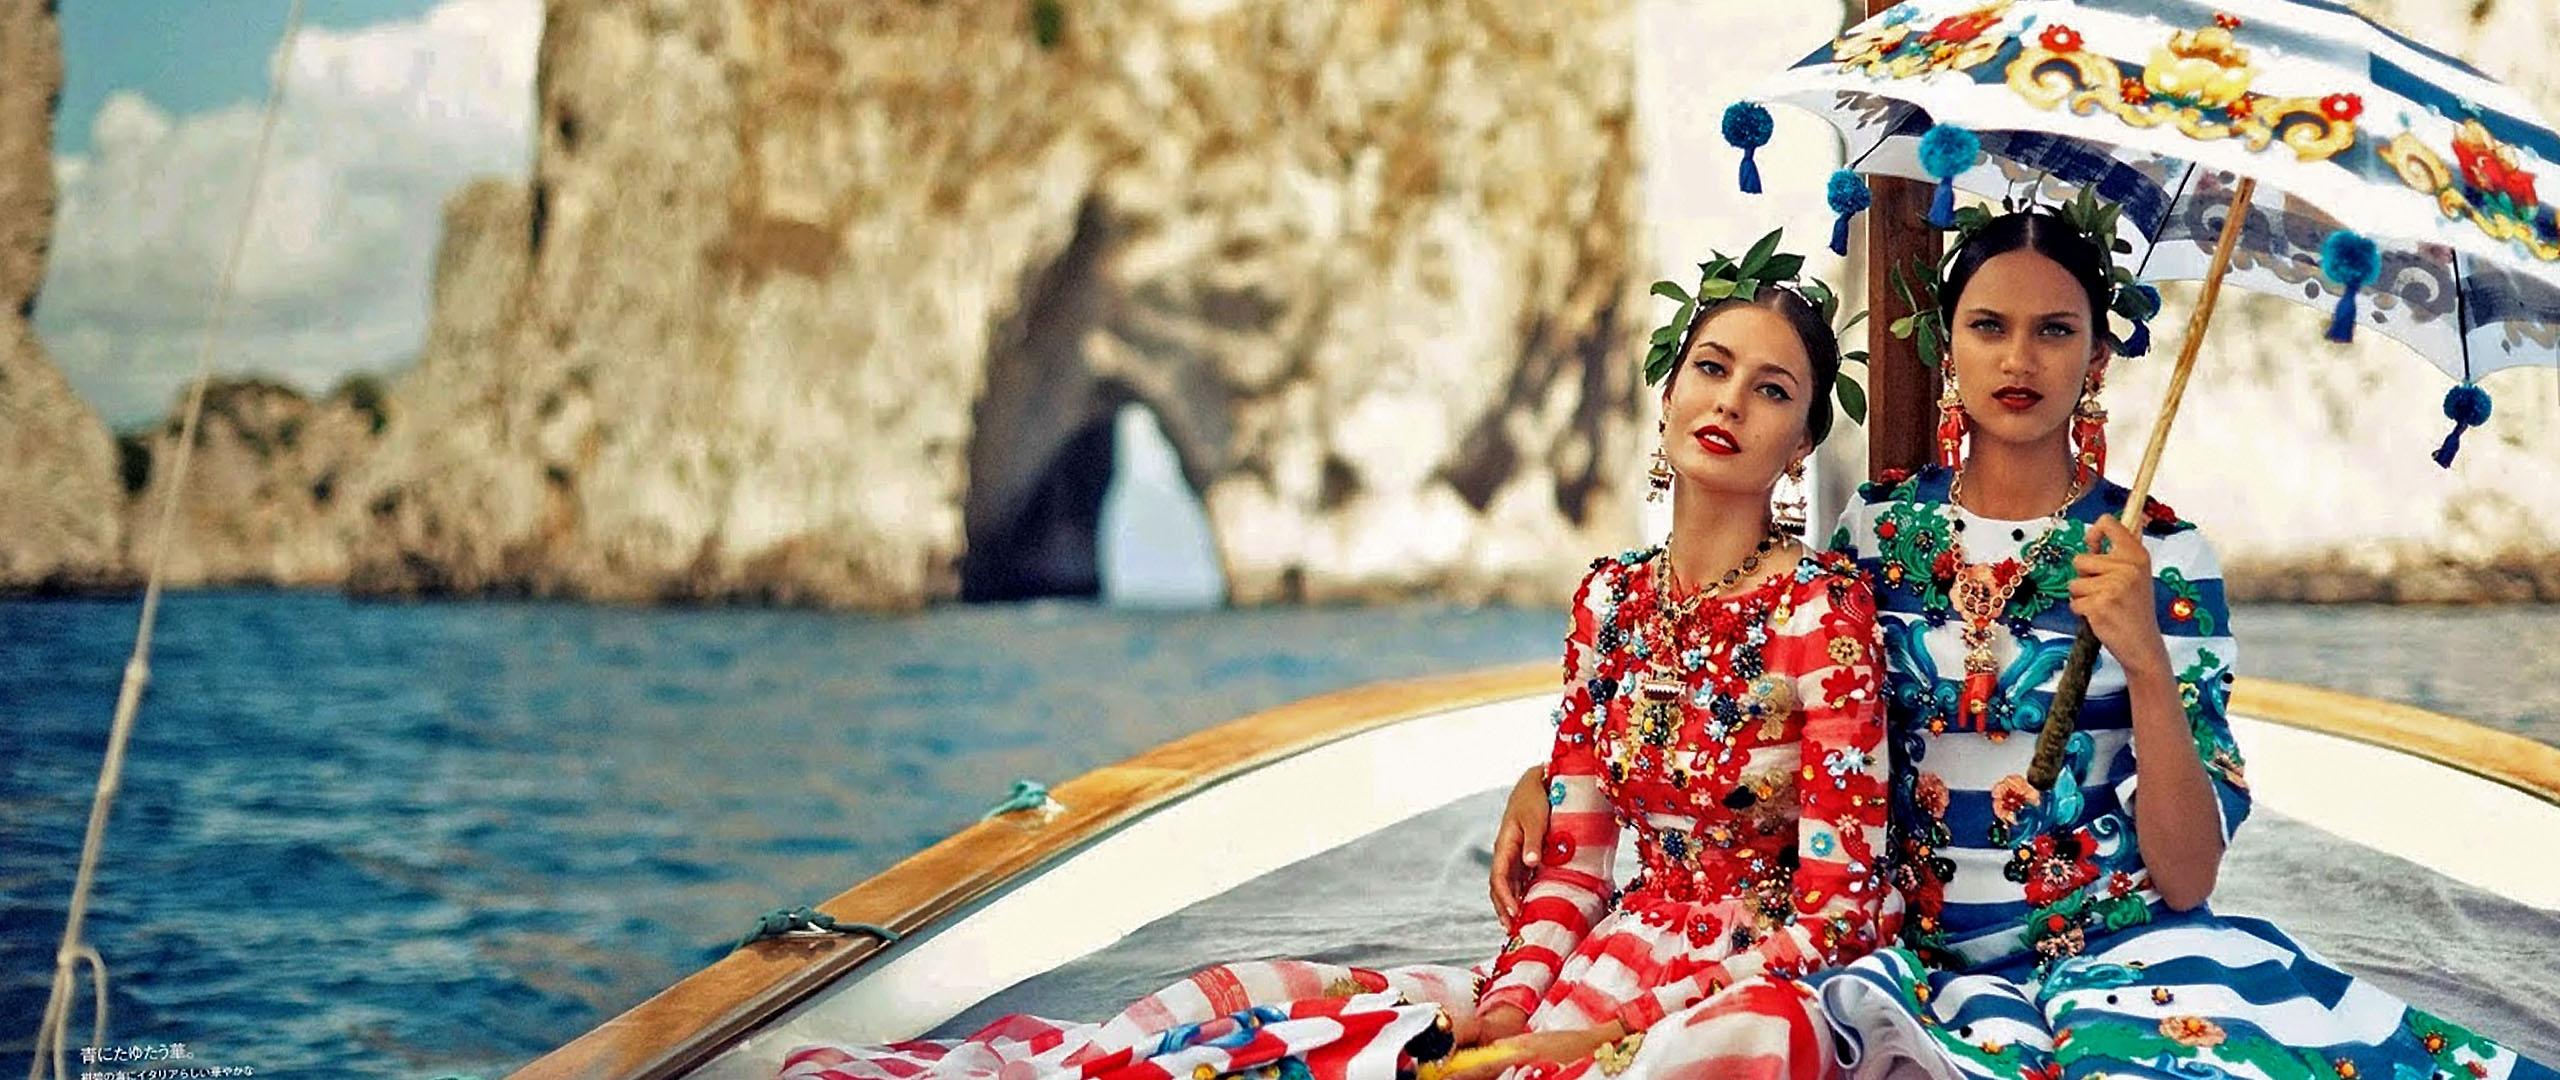 Hair Stylist Napoli Dolce & Gabbana